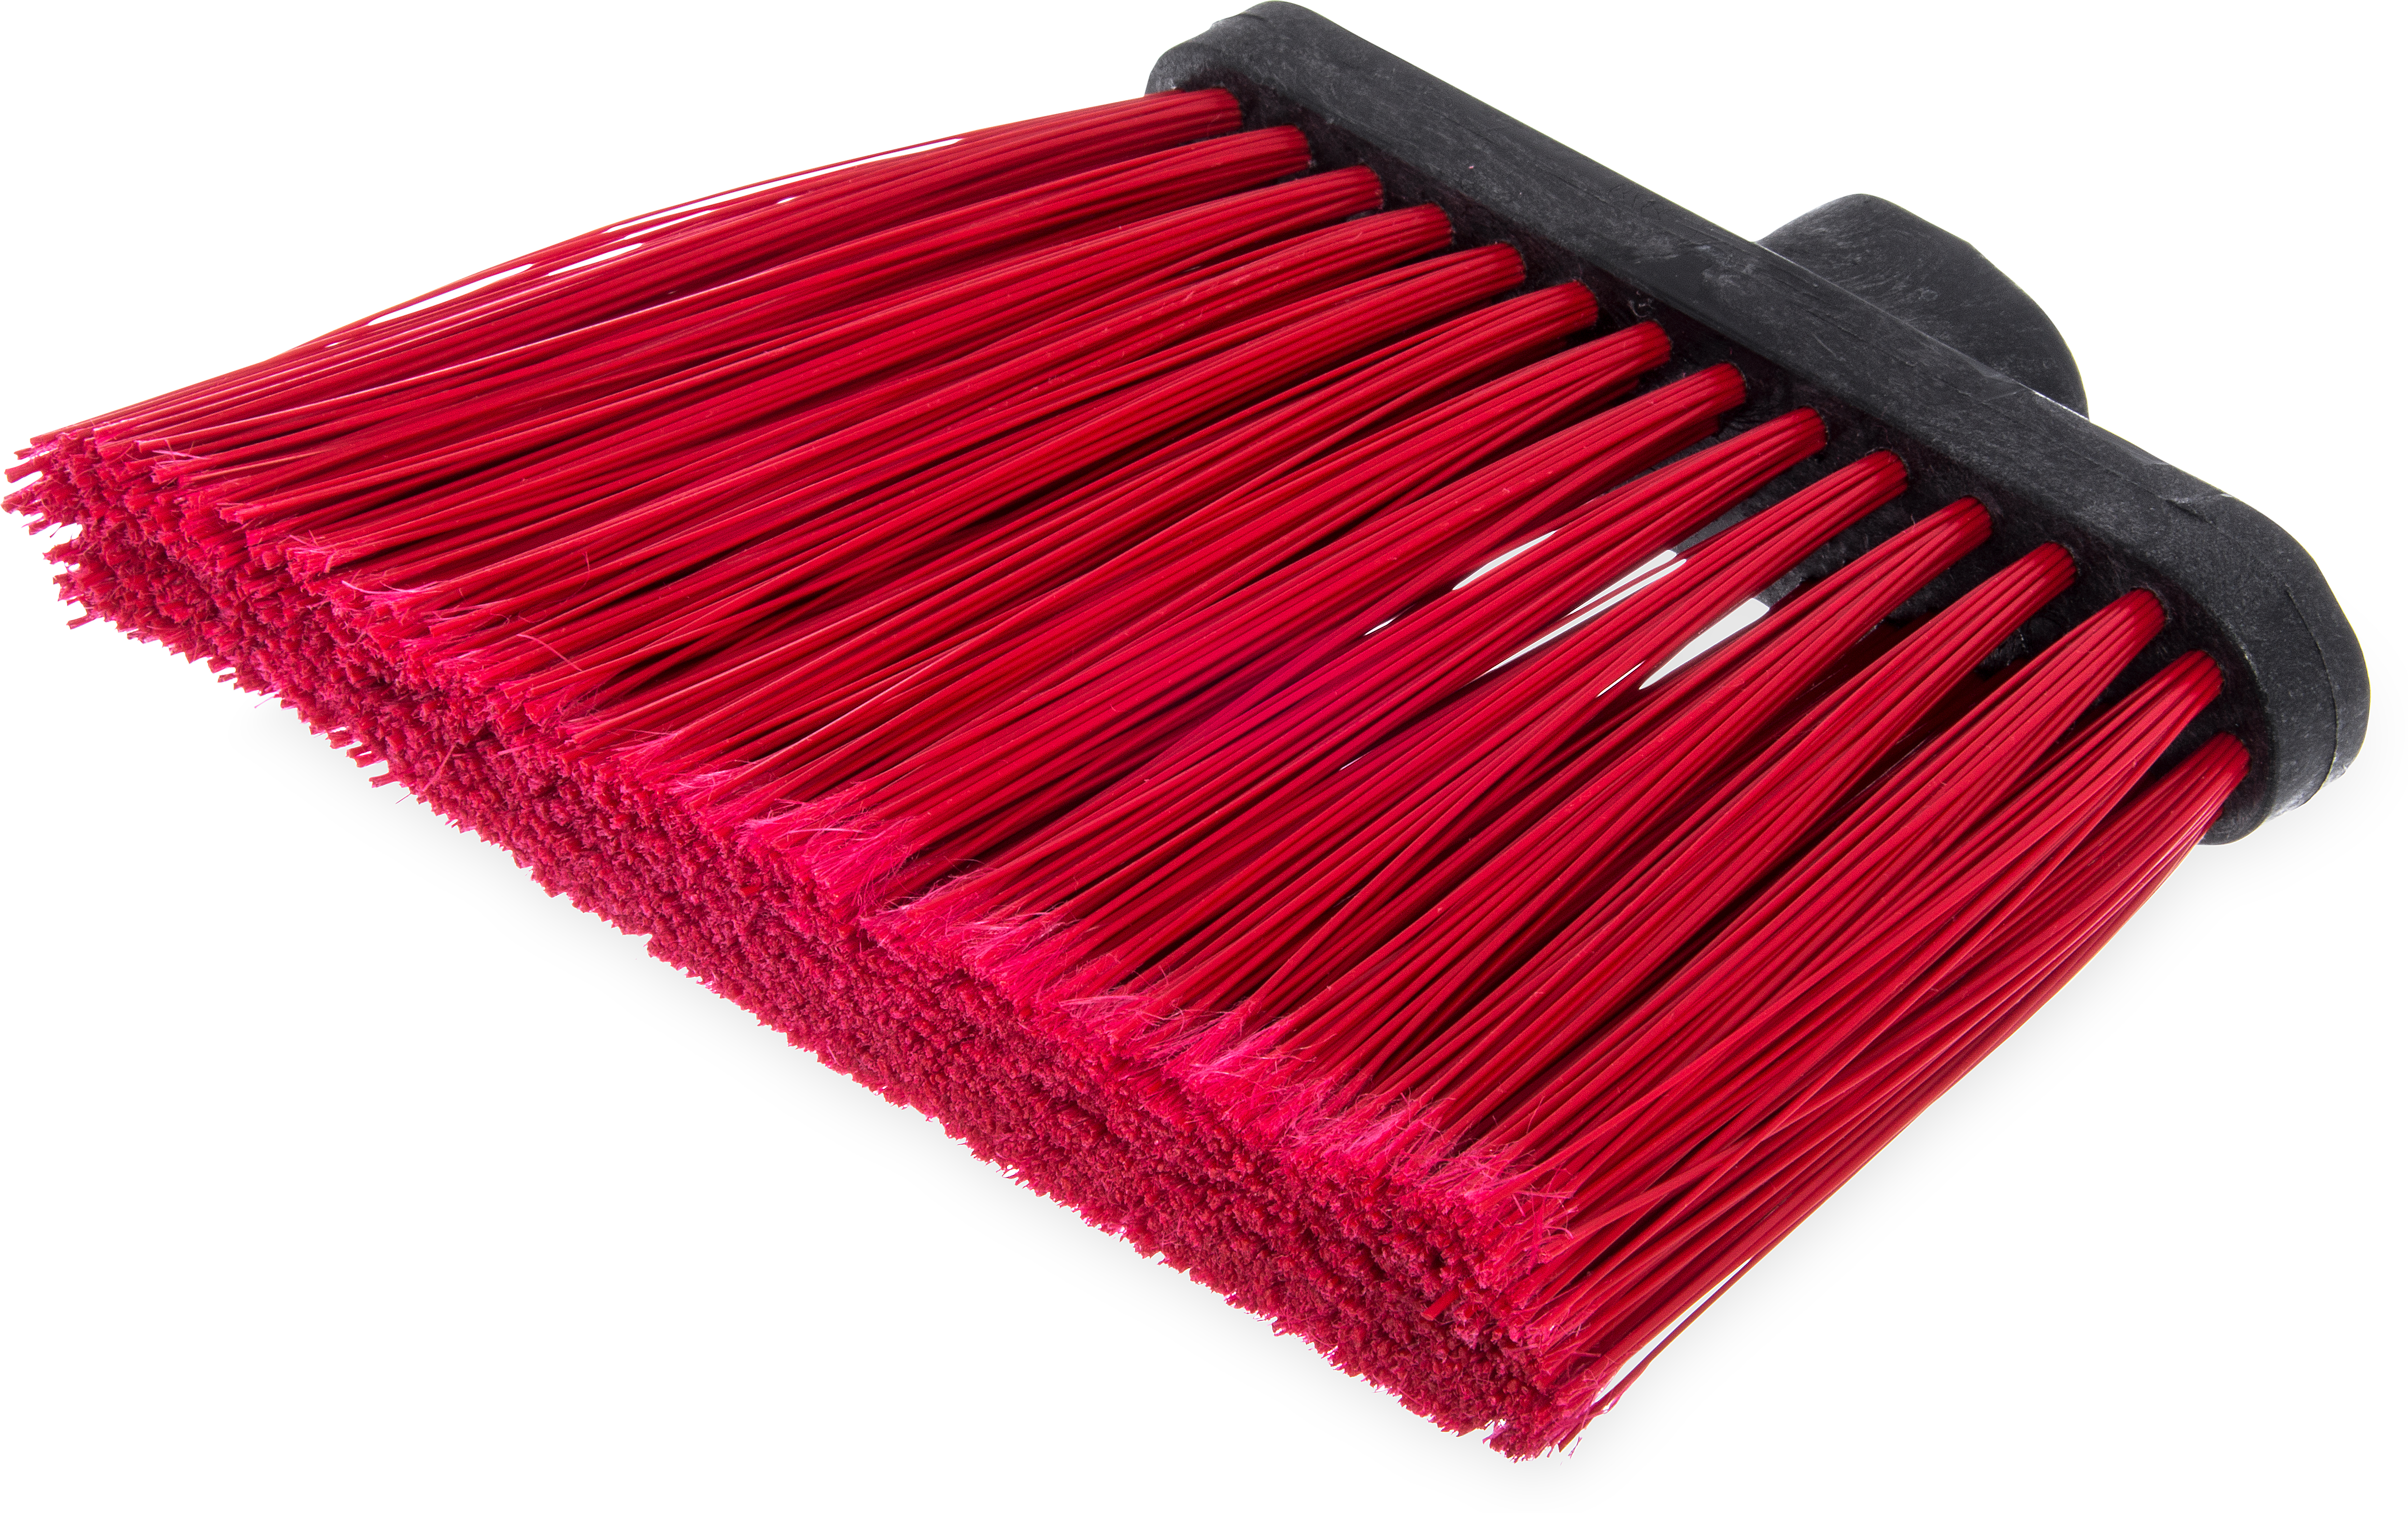 Carlisle 3686705 duo-sweep angle brooms